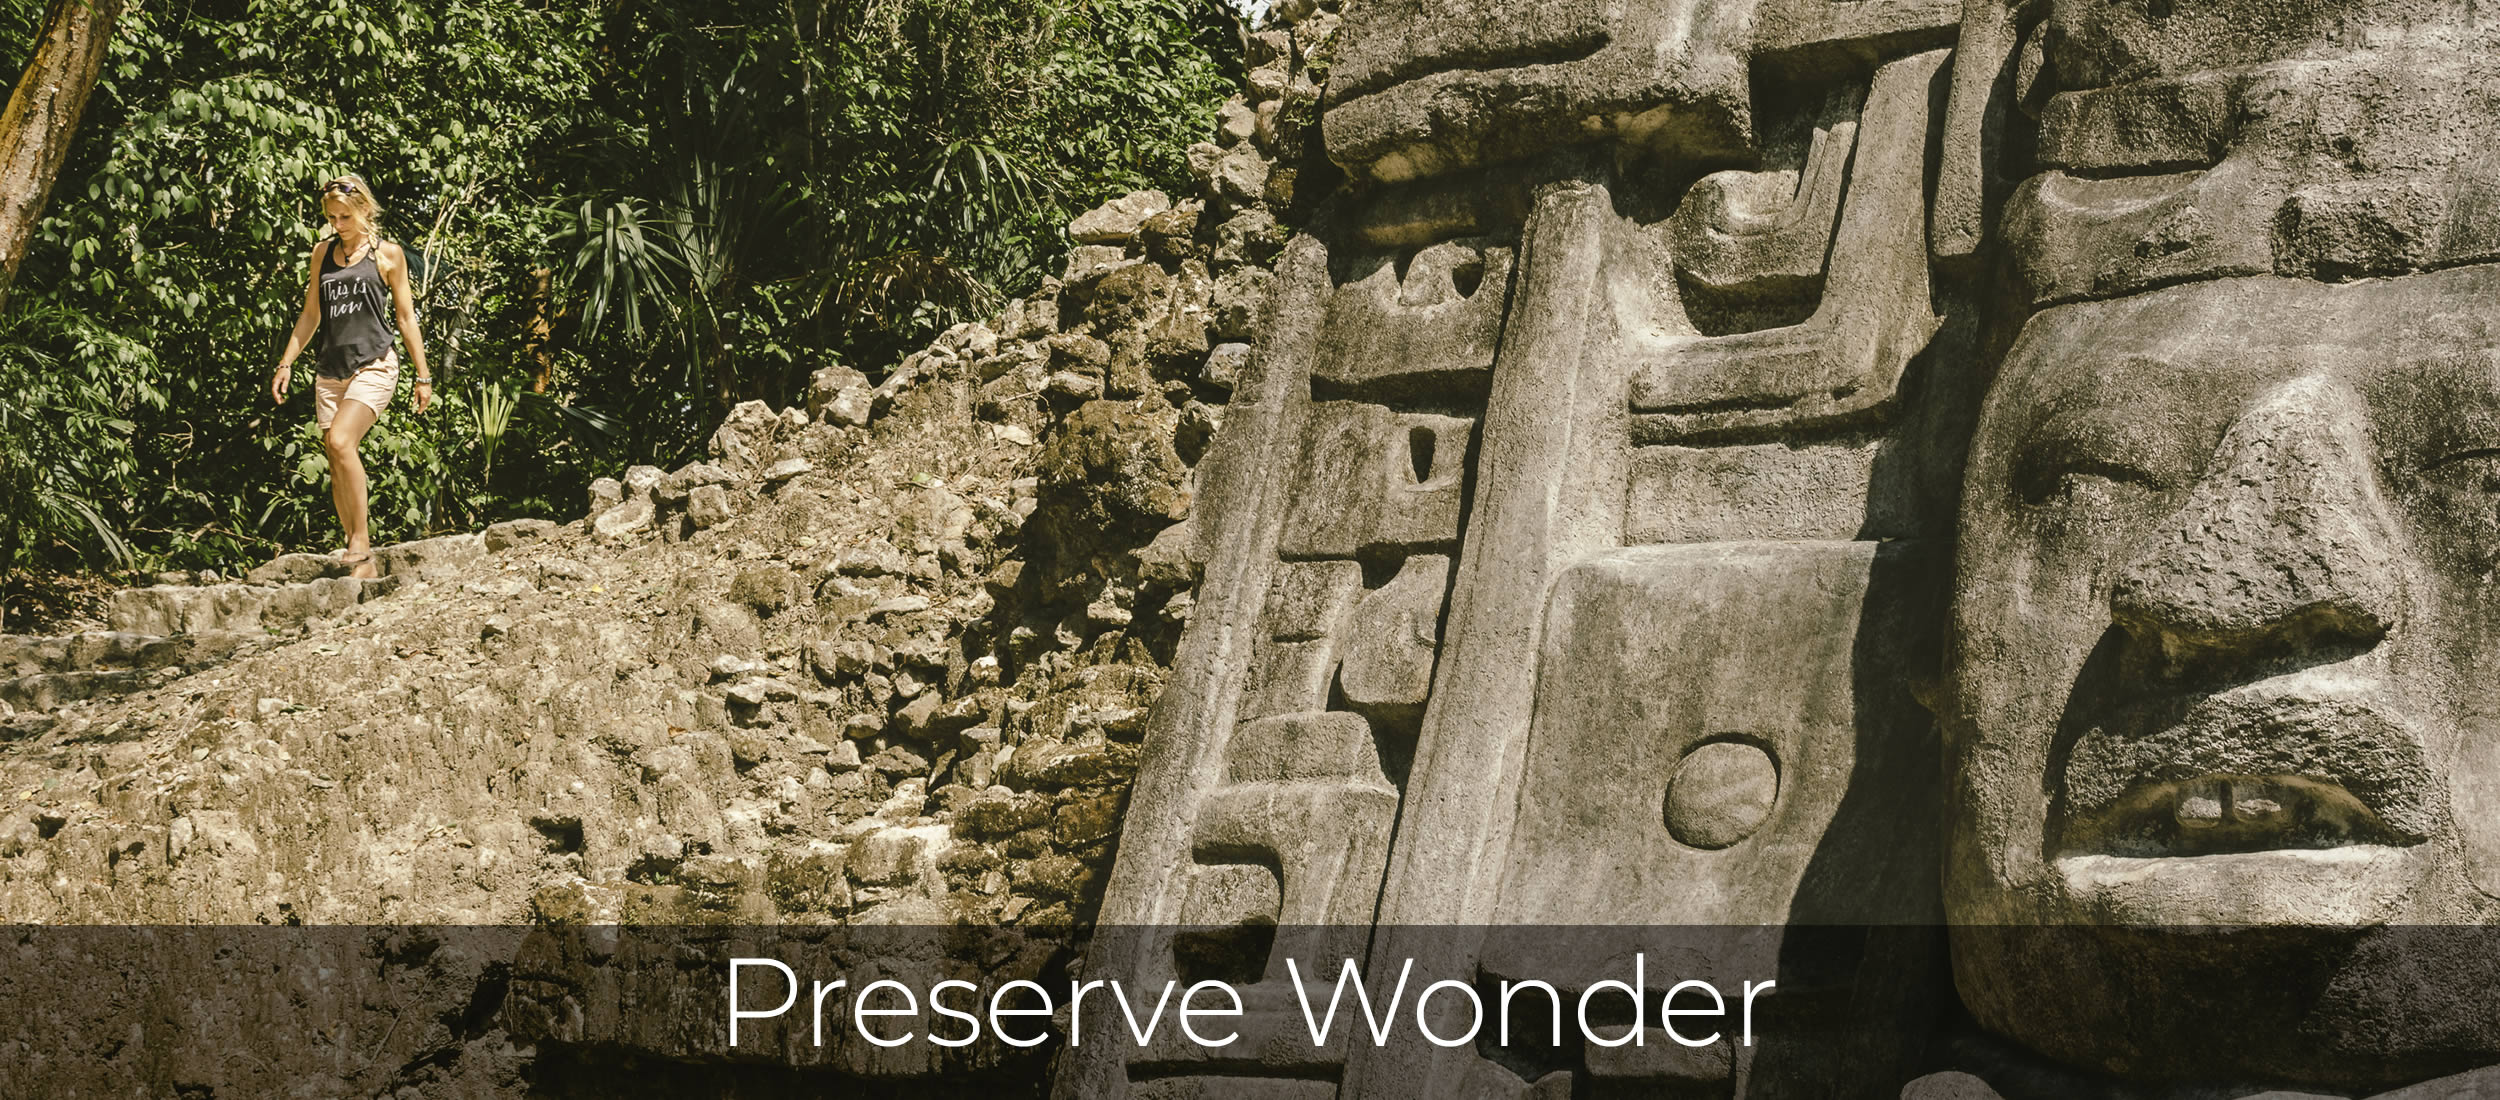 Preserve Wonder